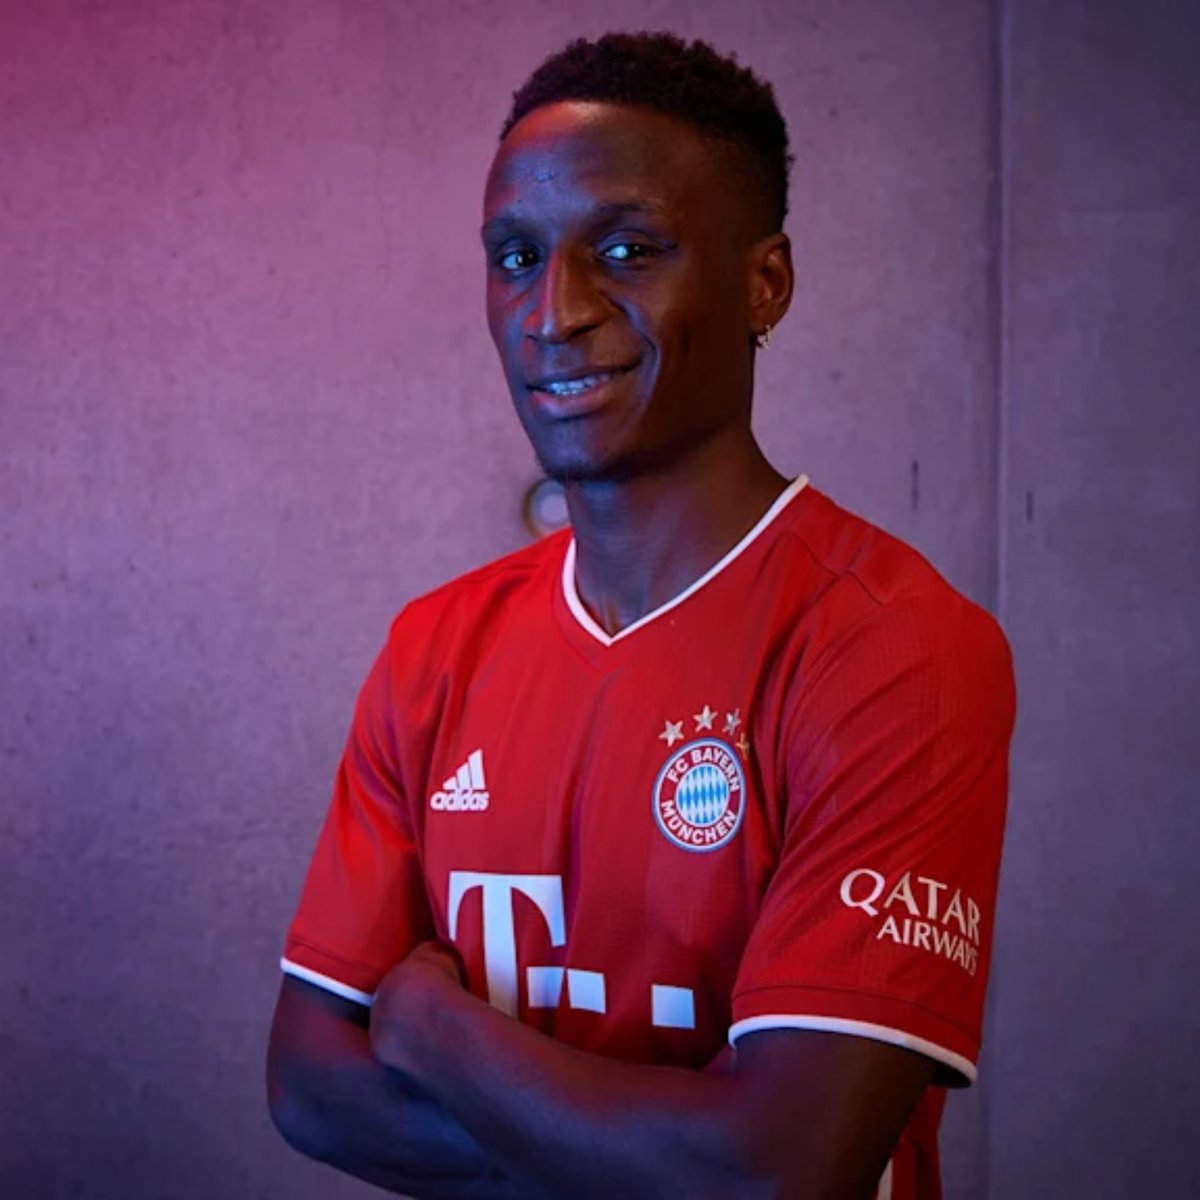 @InvictosSomos's photo on Bayern Munich